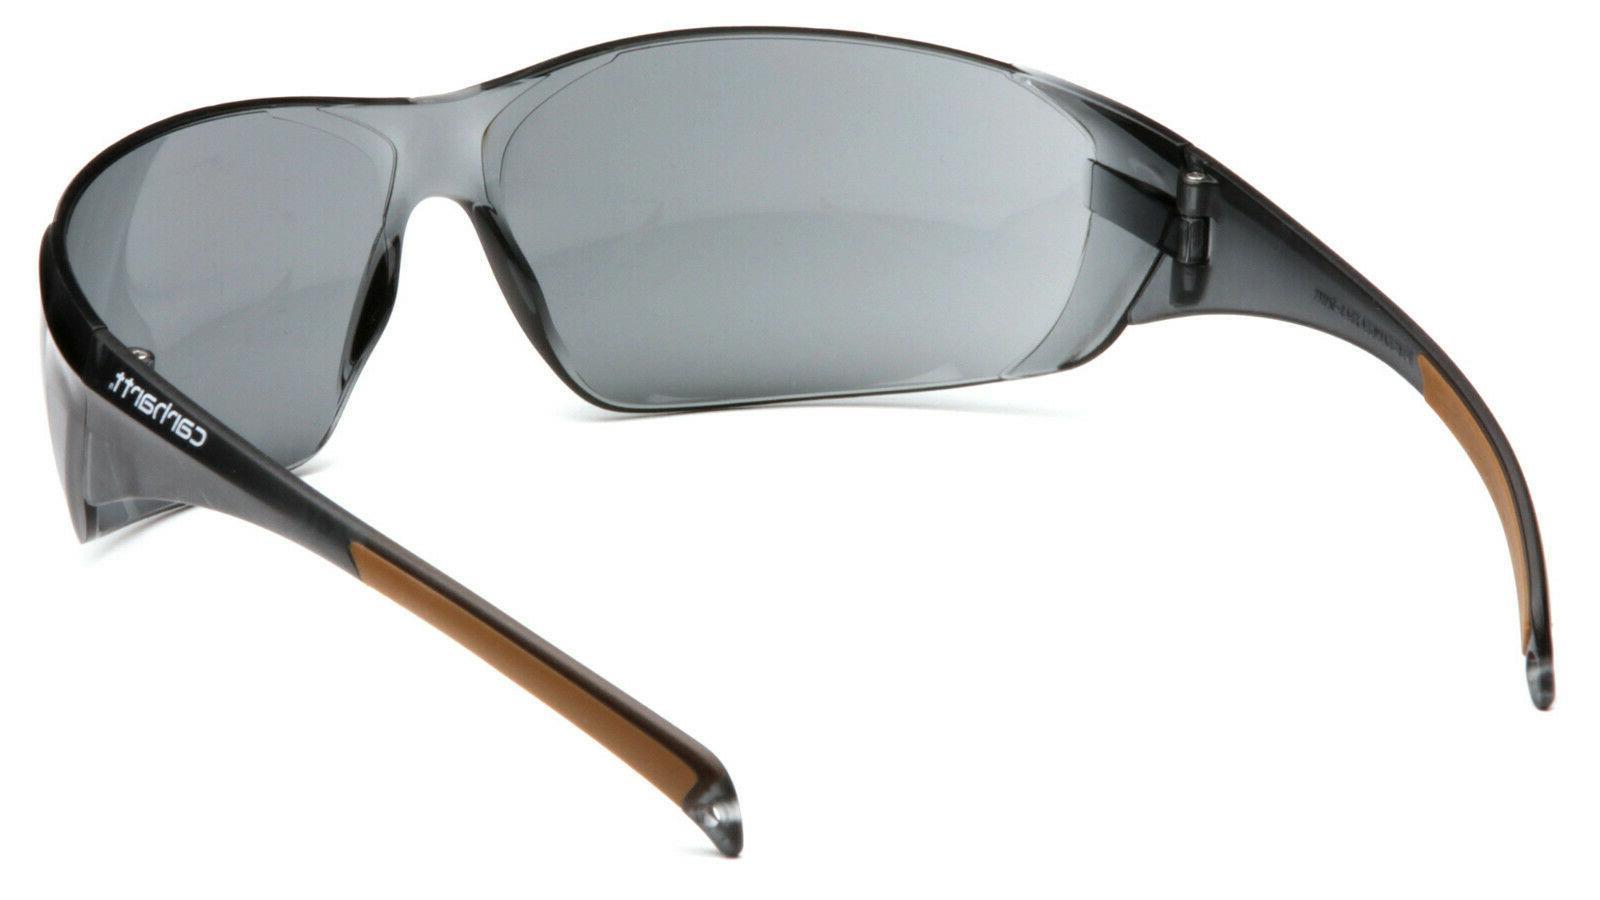 Carhartt Smoke/Gray Fog Sunglasses Z87+